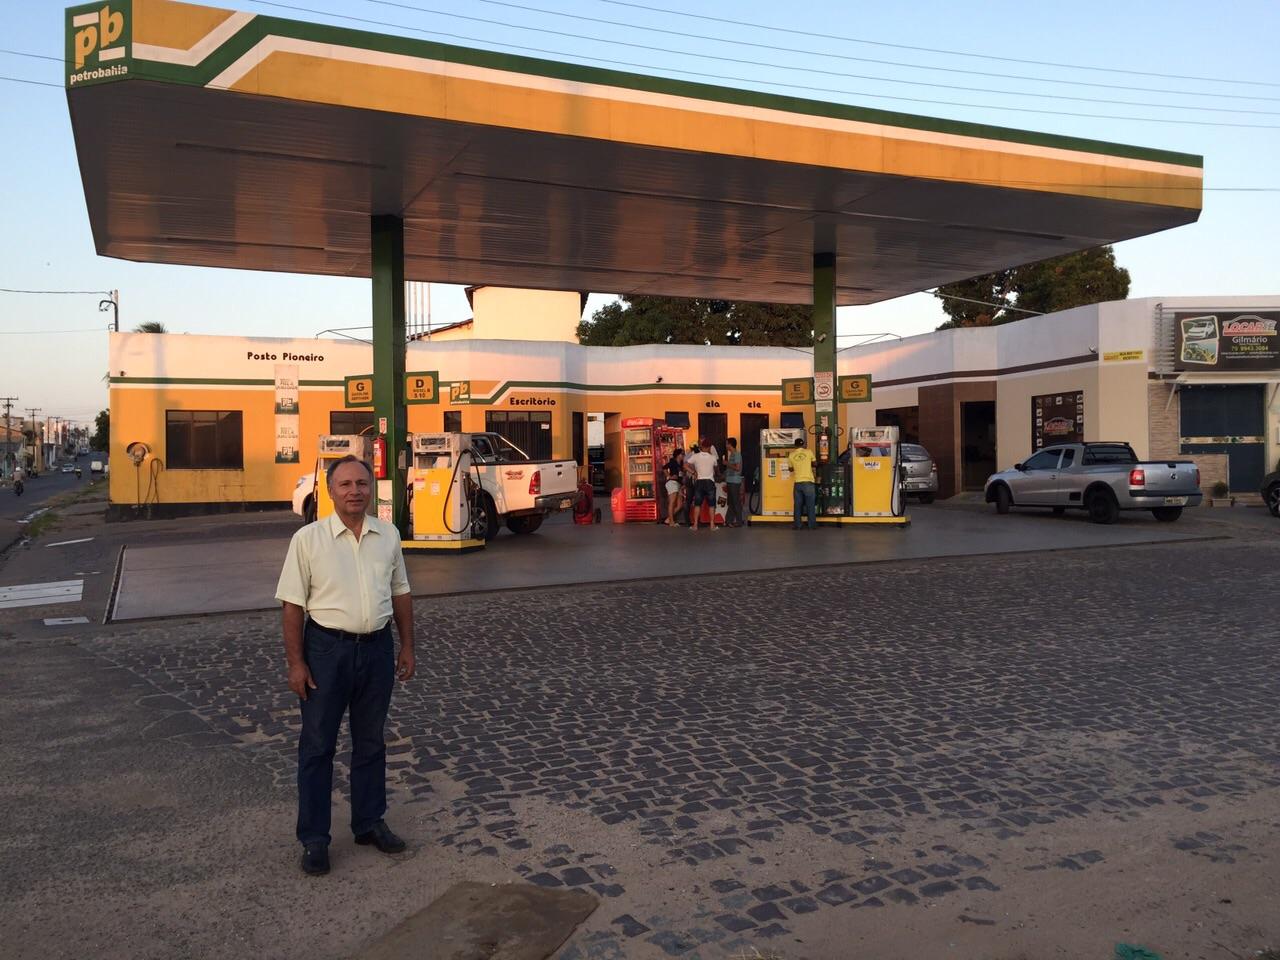 Justica-autoriza-empresario-a-fechar-posto-de-gasolina-aos-sabados